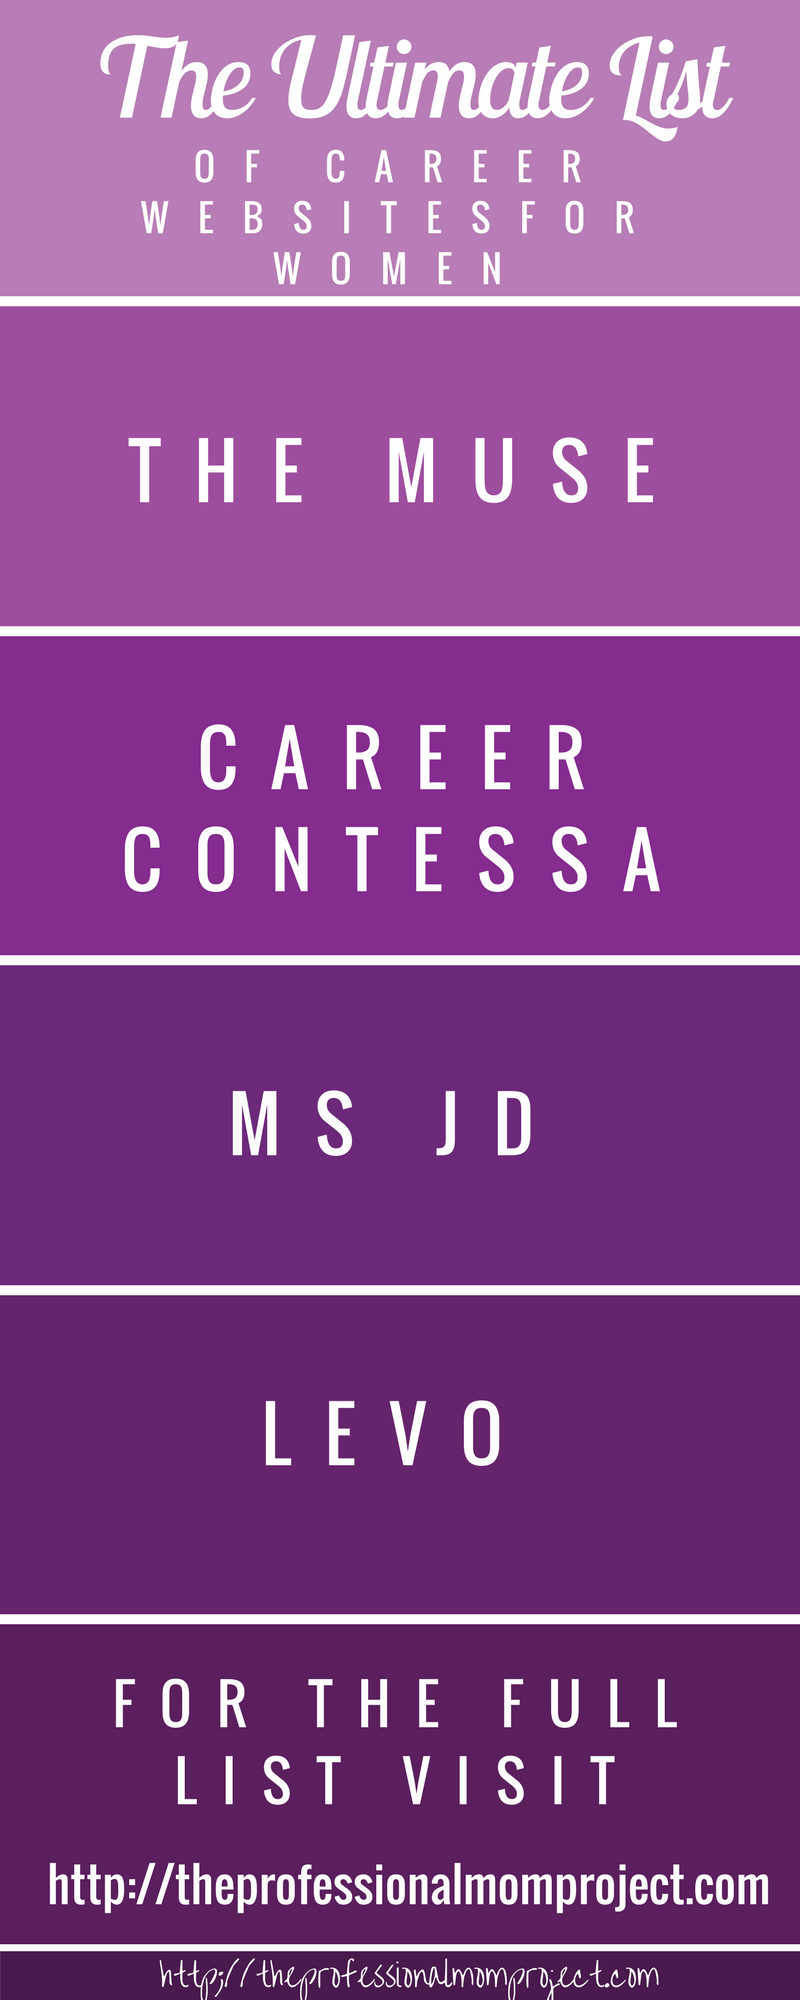 The ultimate list of career websites for women | career advice for women | professional mom | working mom | career tips